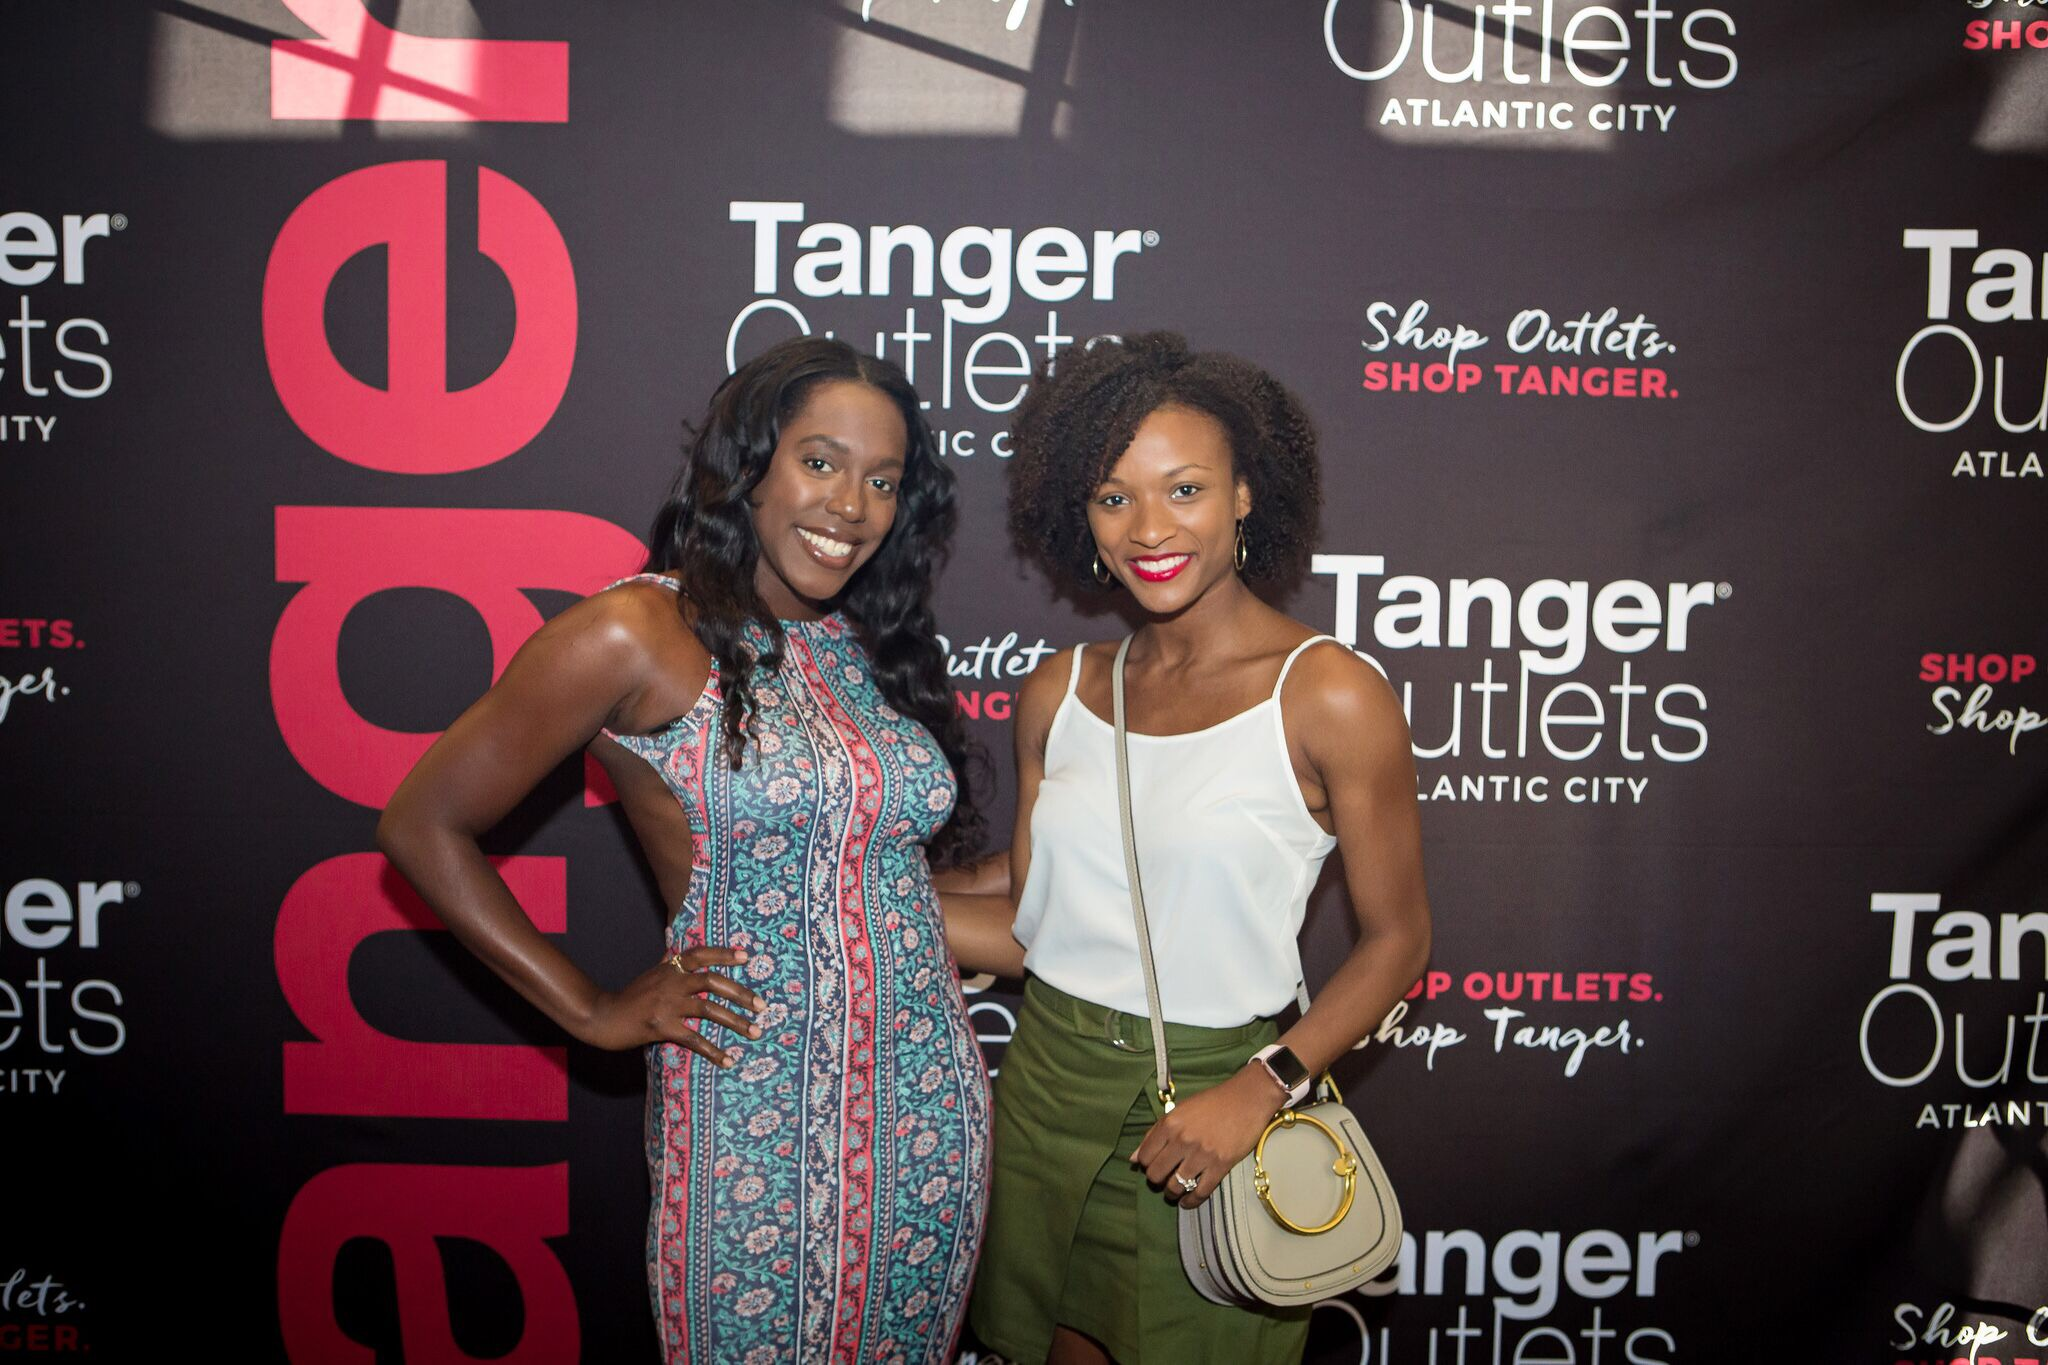 Tanger Outlets Blogger Event